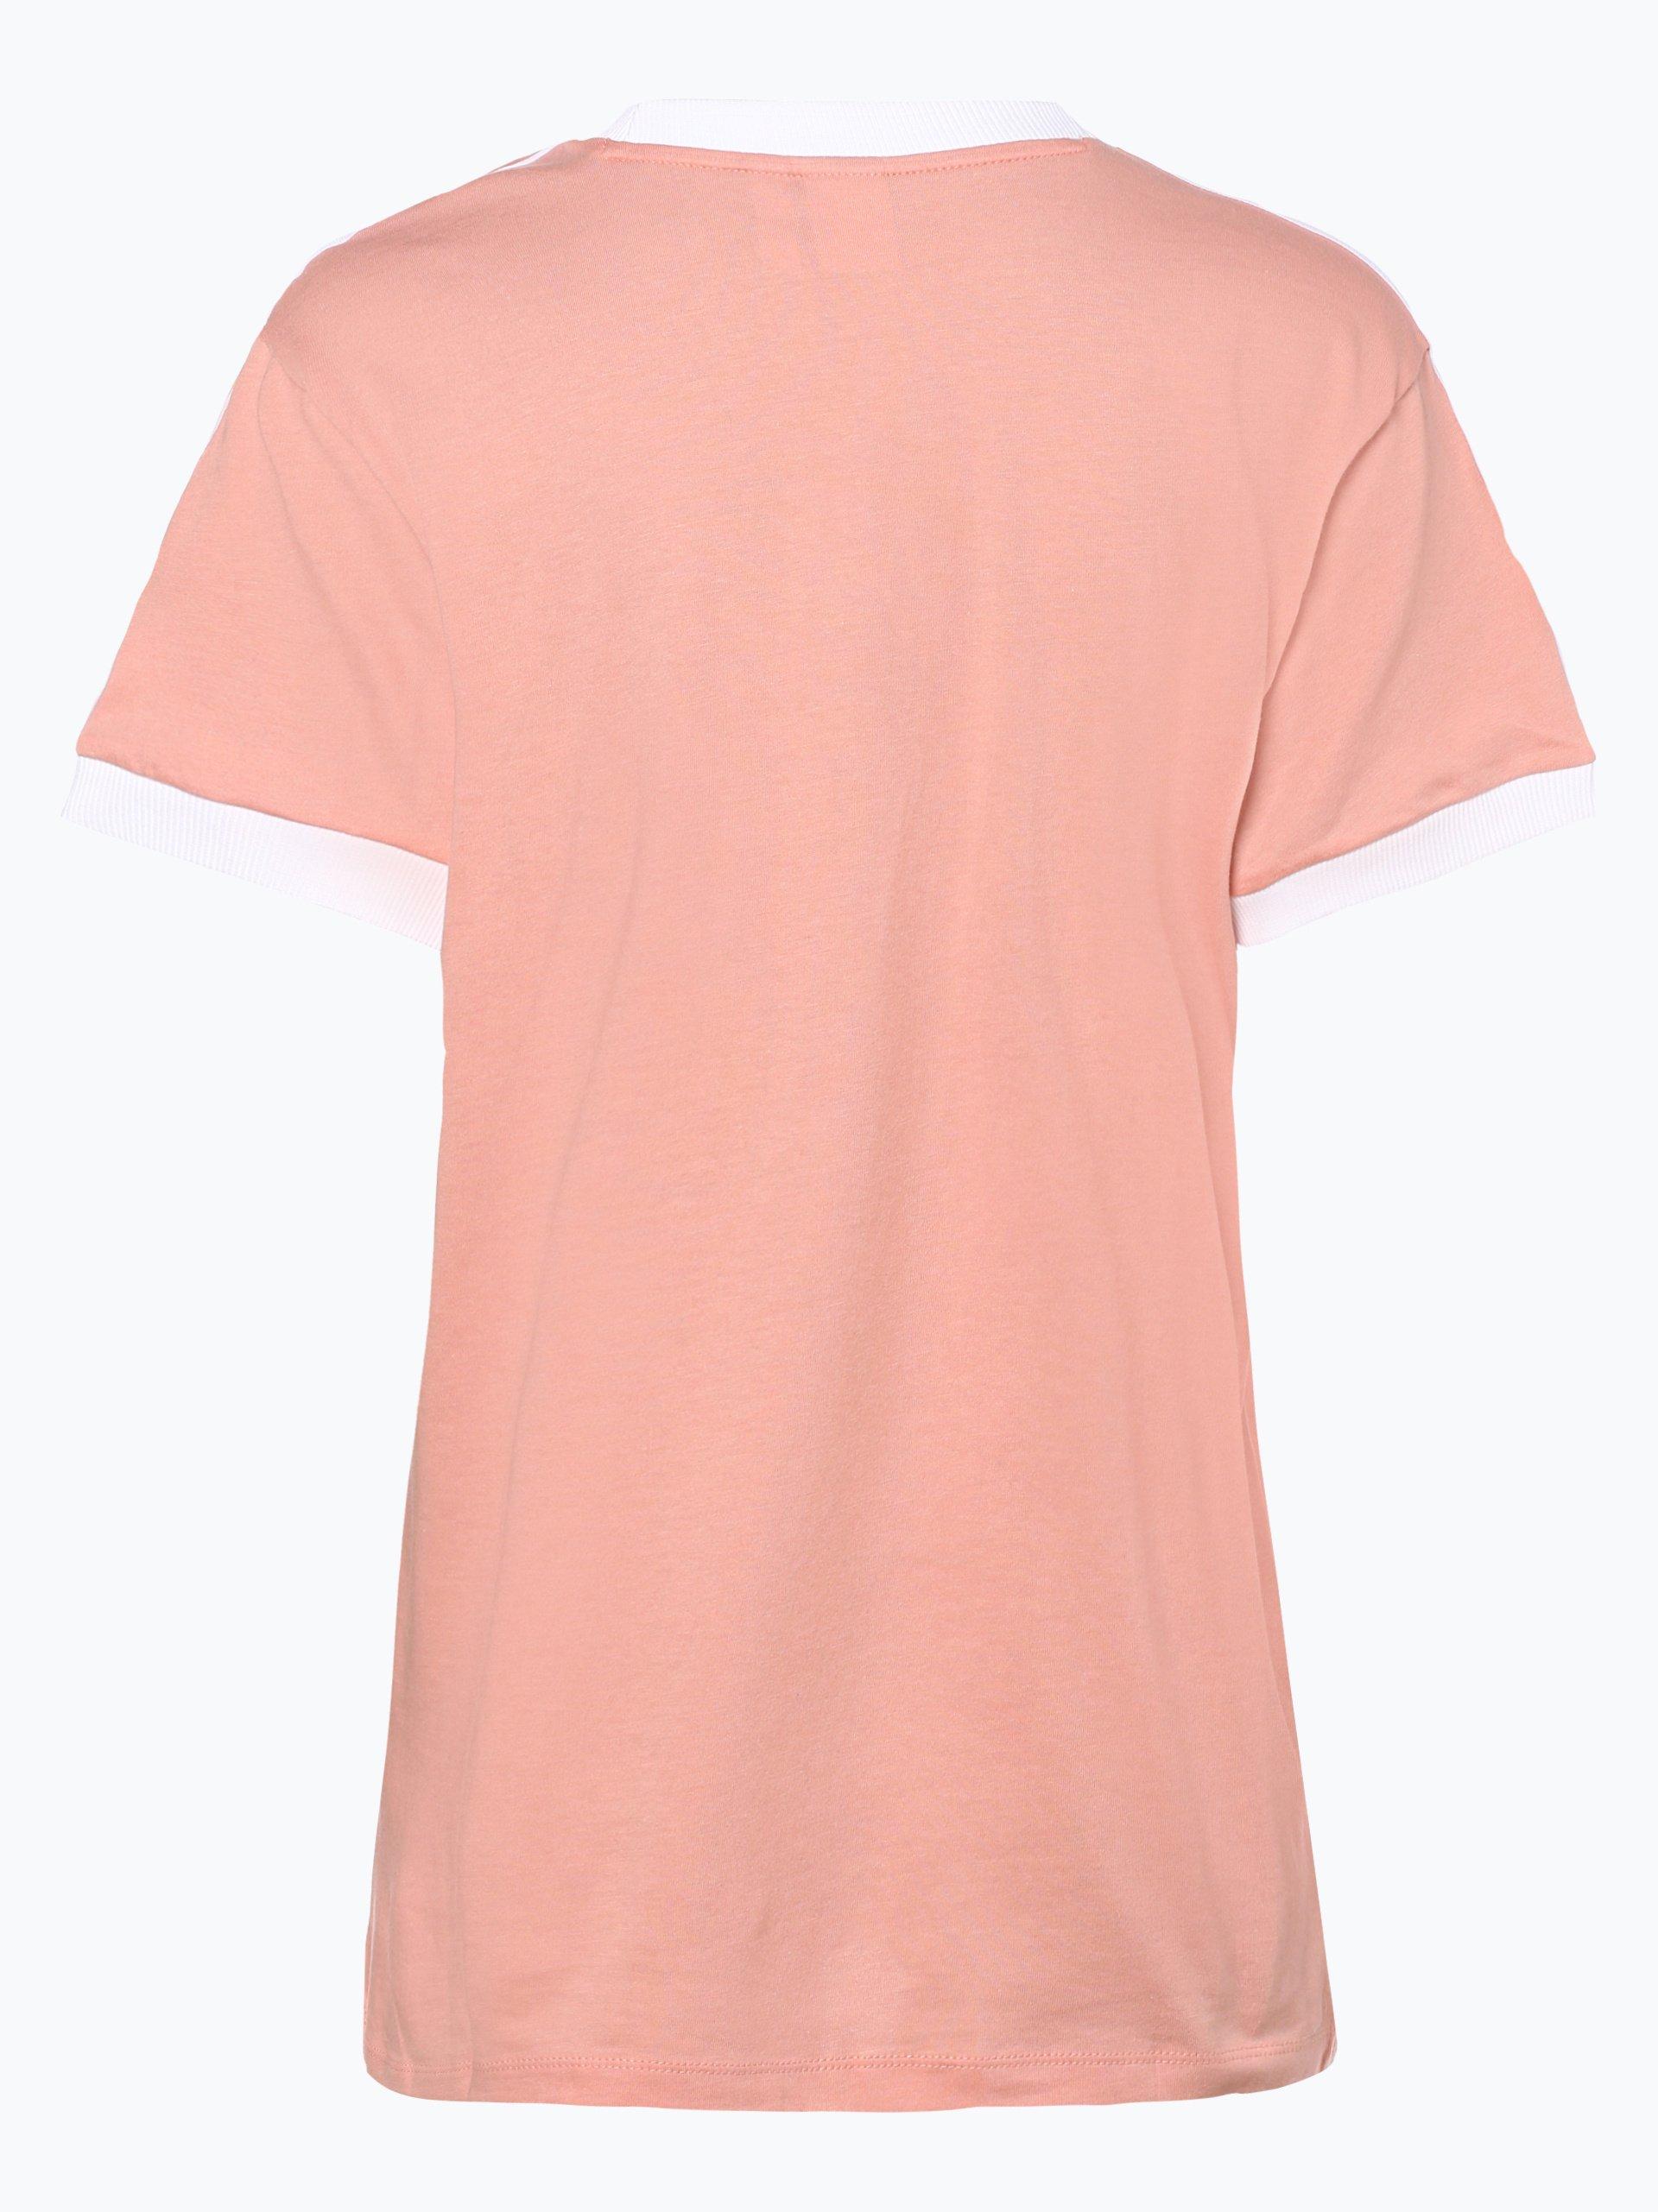 adidas Originals T-shirt damski